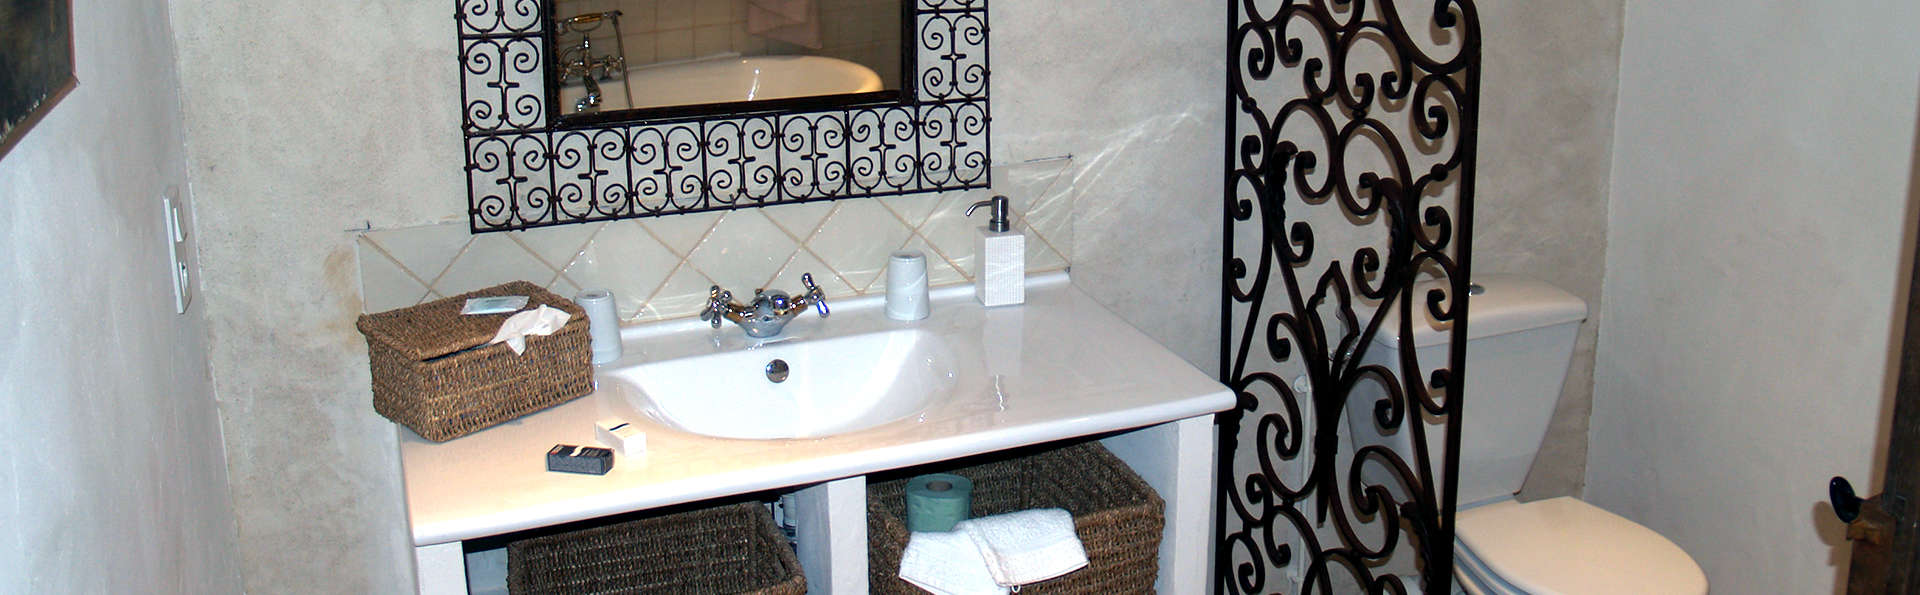 Château de Forges  - Edit_Bathroom.jpg